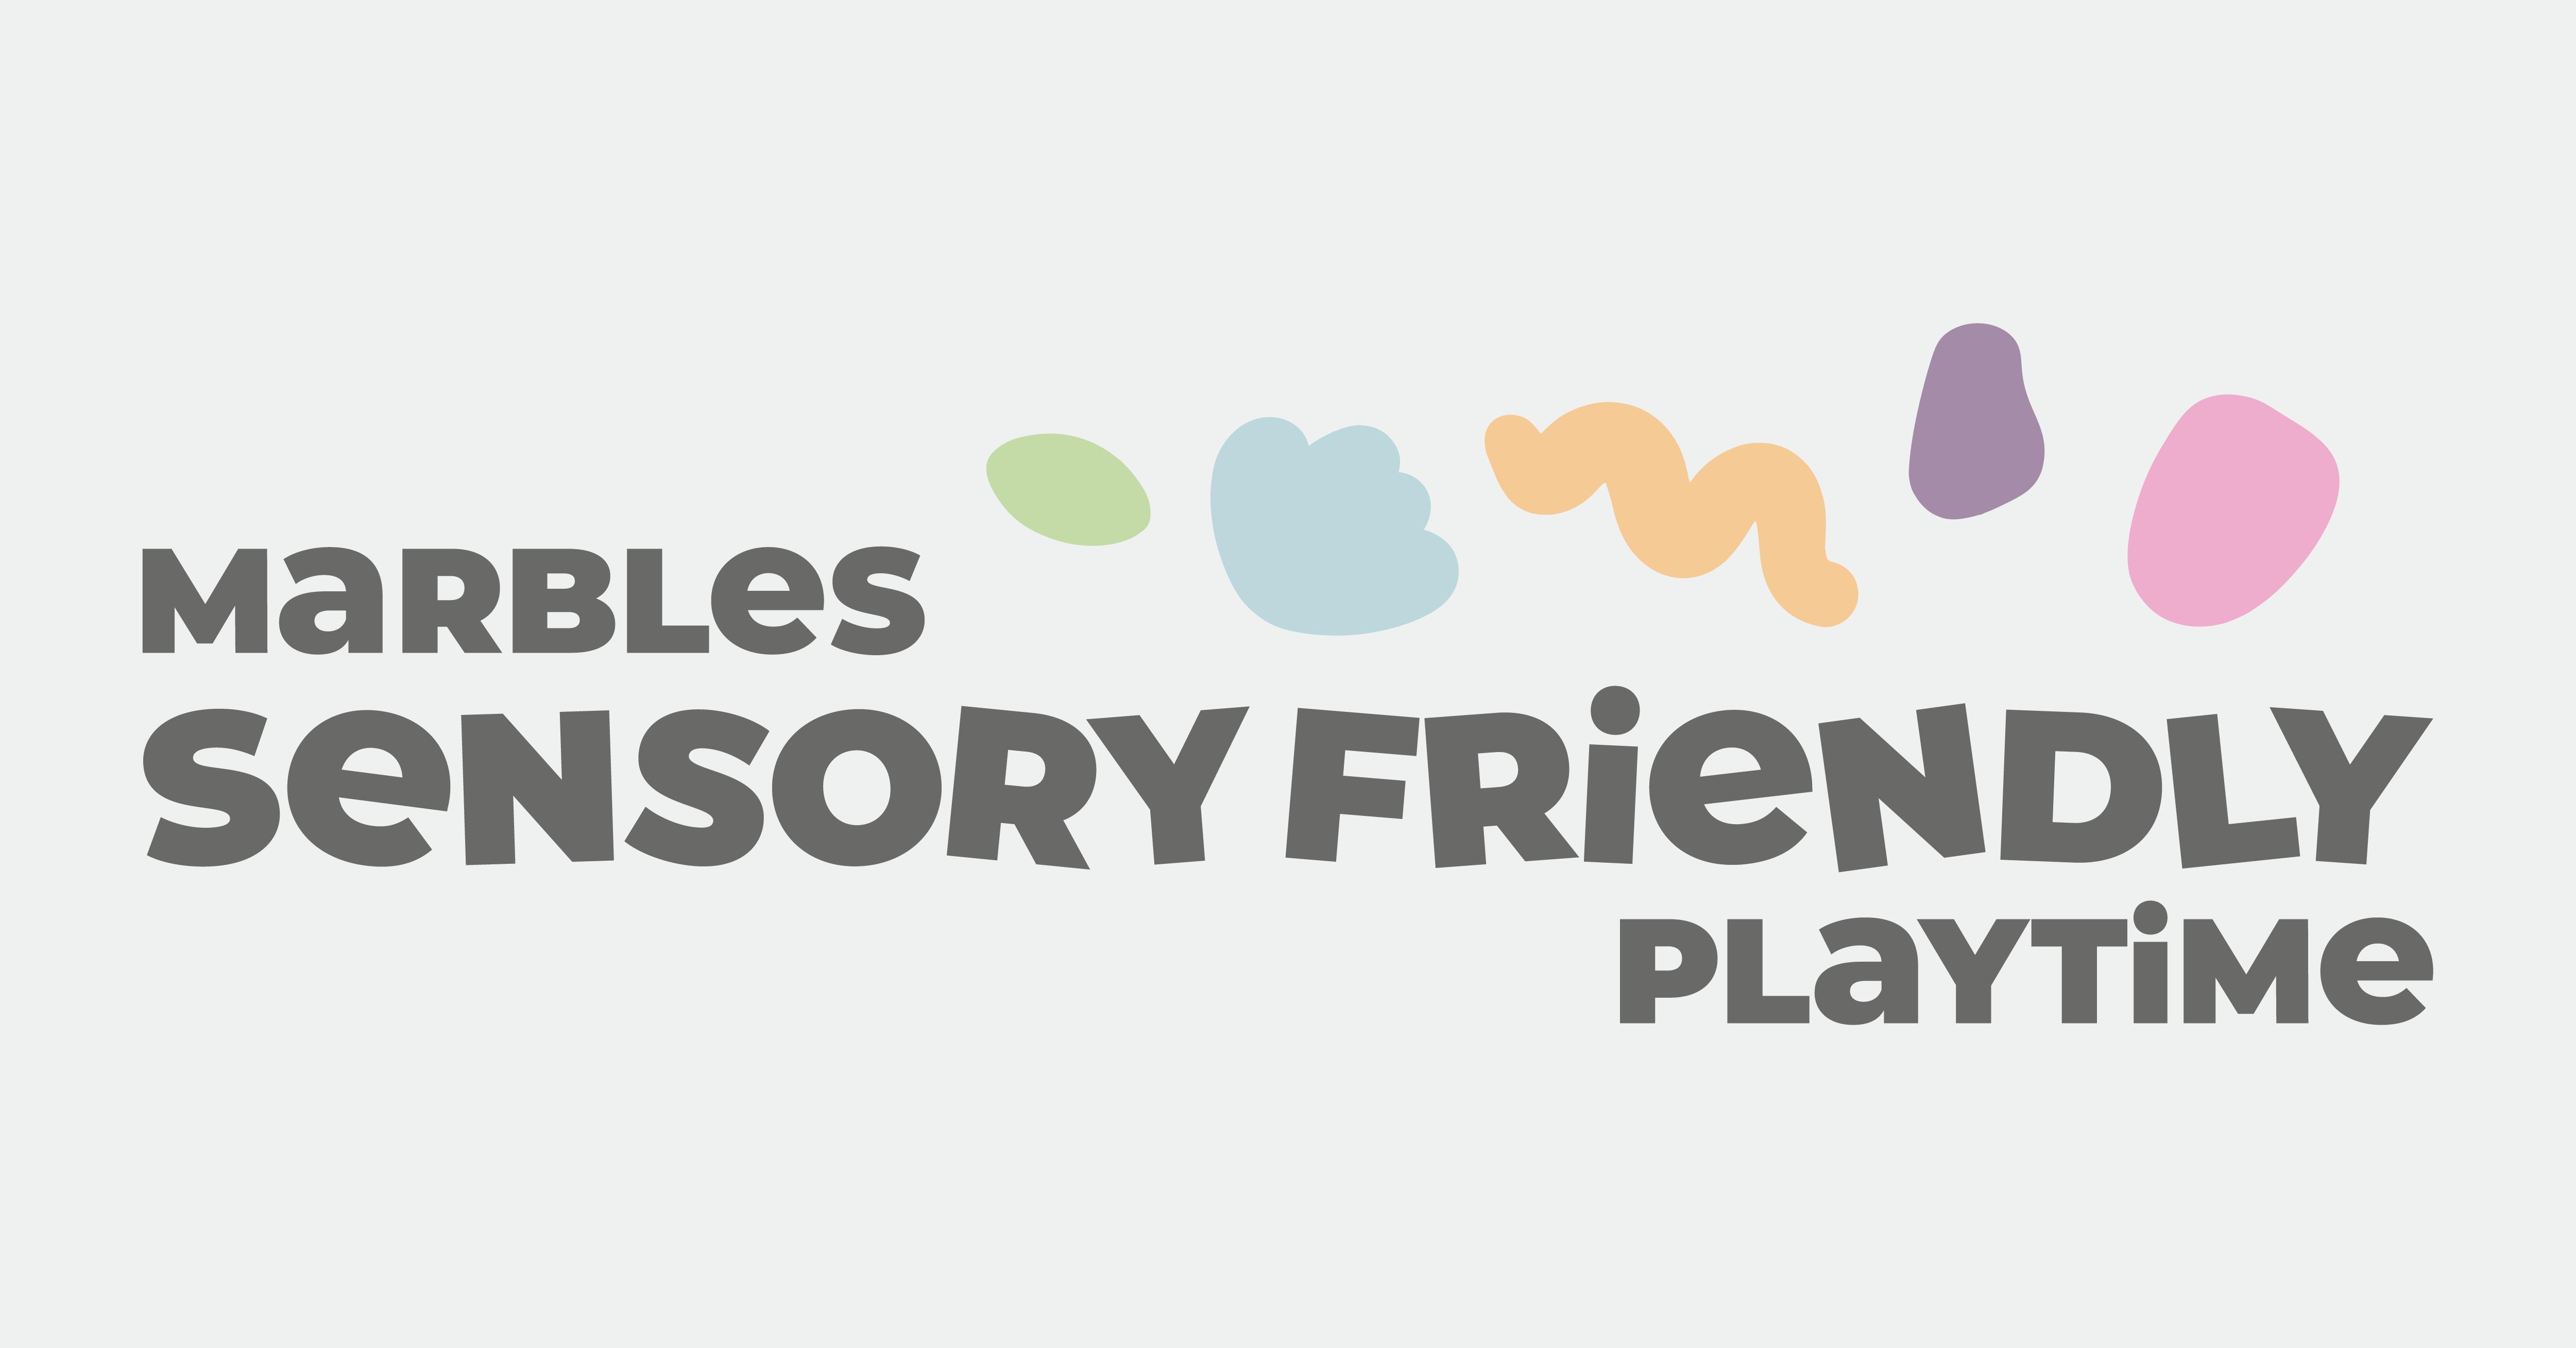 Sensory Friendly Playtime